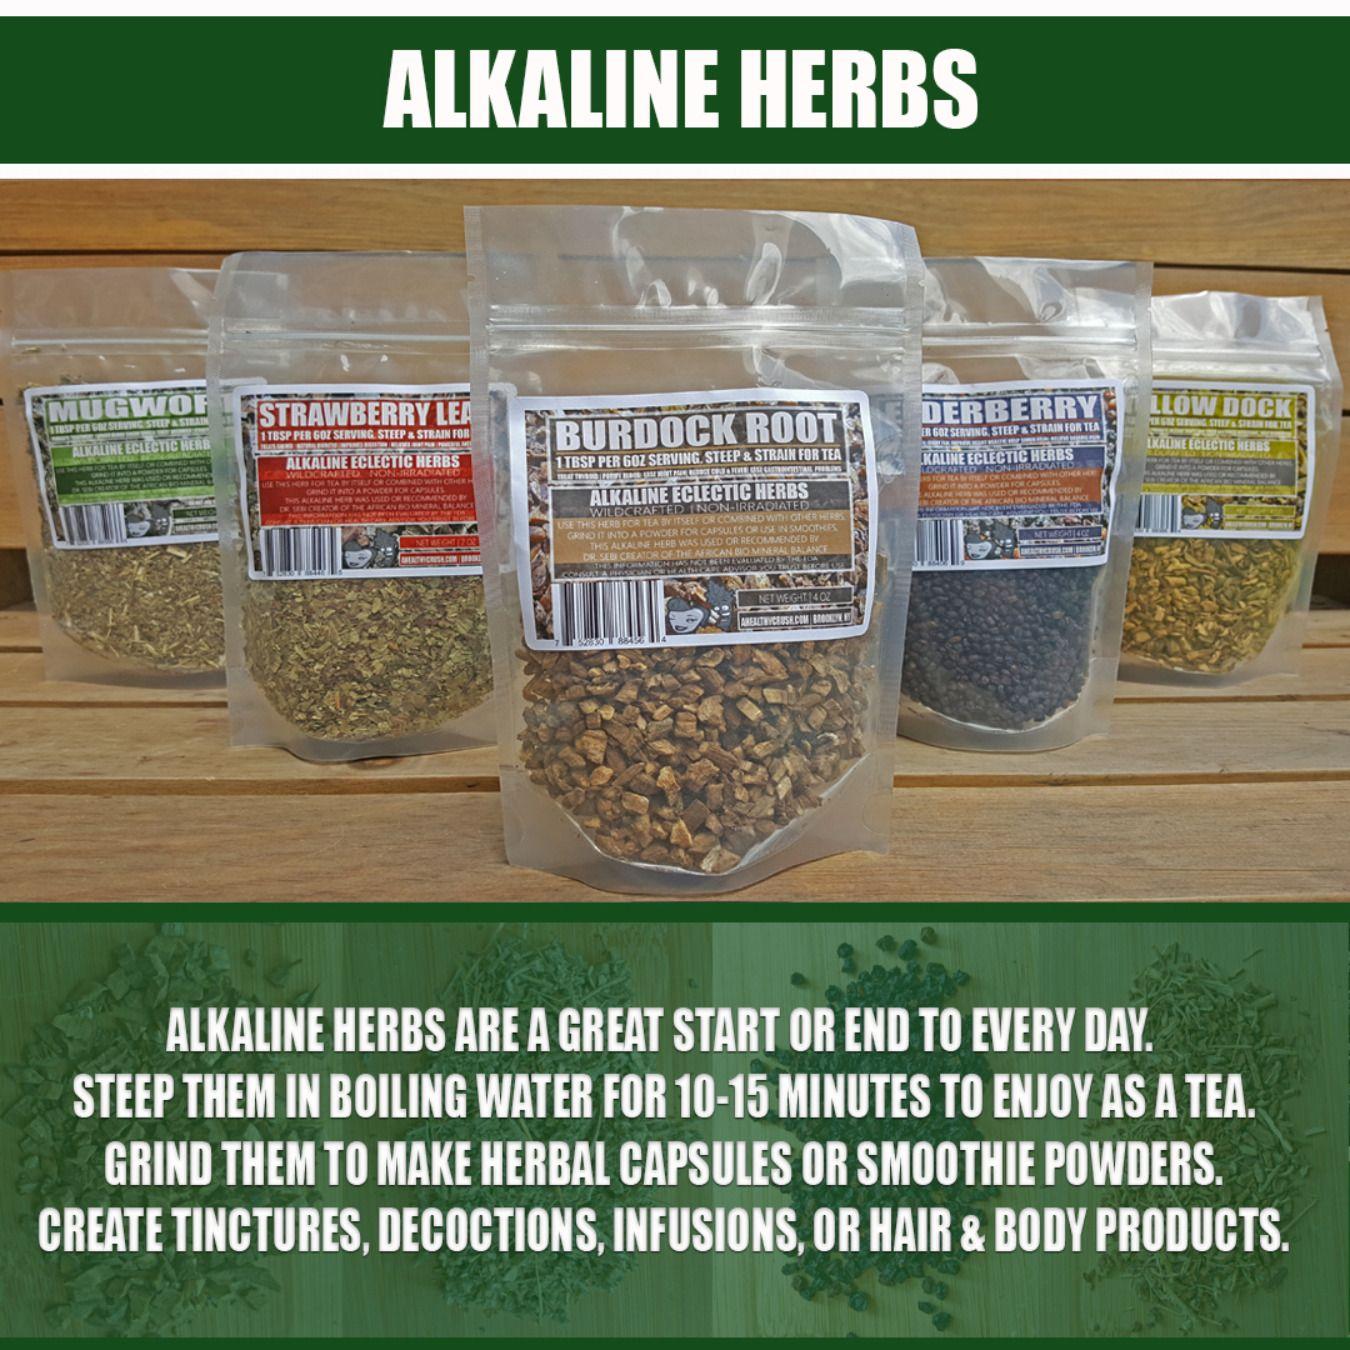 Alkaline herbs | cell food | Alkaline diet, The cure, Health benefits